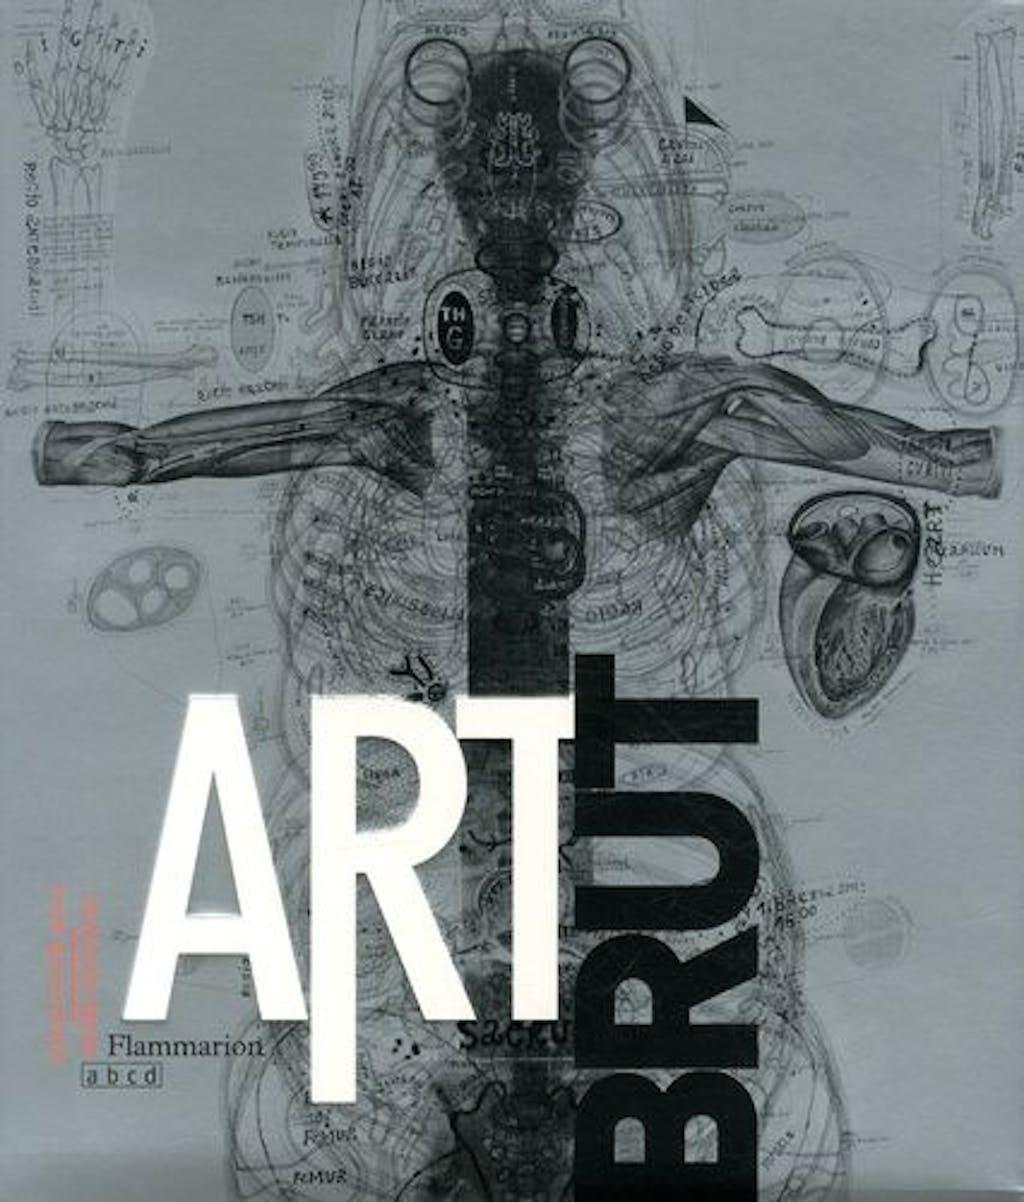 Art brut, collection abcd / Bruno Decharme - © christian berst — art brut